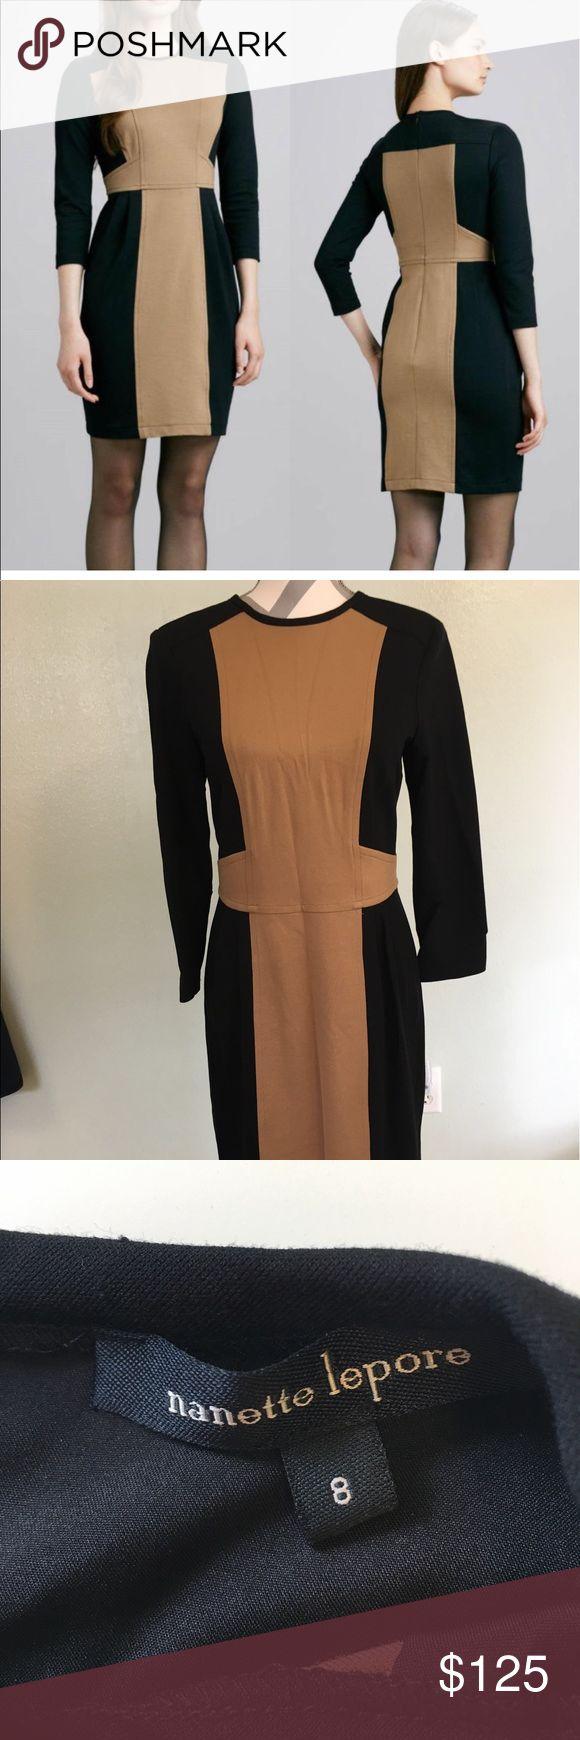 Nanette Lepore Rabat Sheath Never worn. Black and Camel Ponte.   Work or evening dress.     Long zipper in back and 3/4 sleeve. Nanette Lepore Dresses